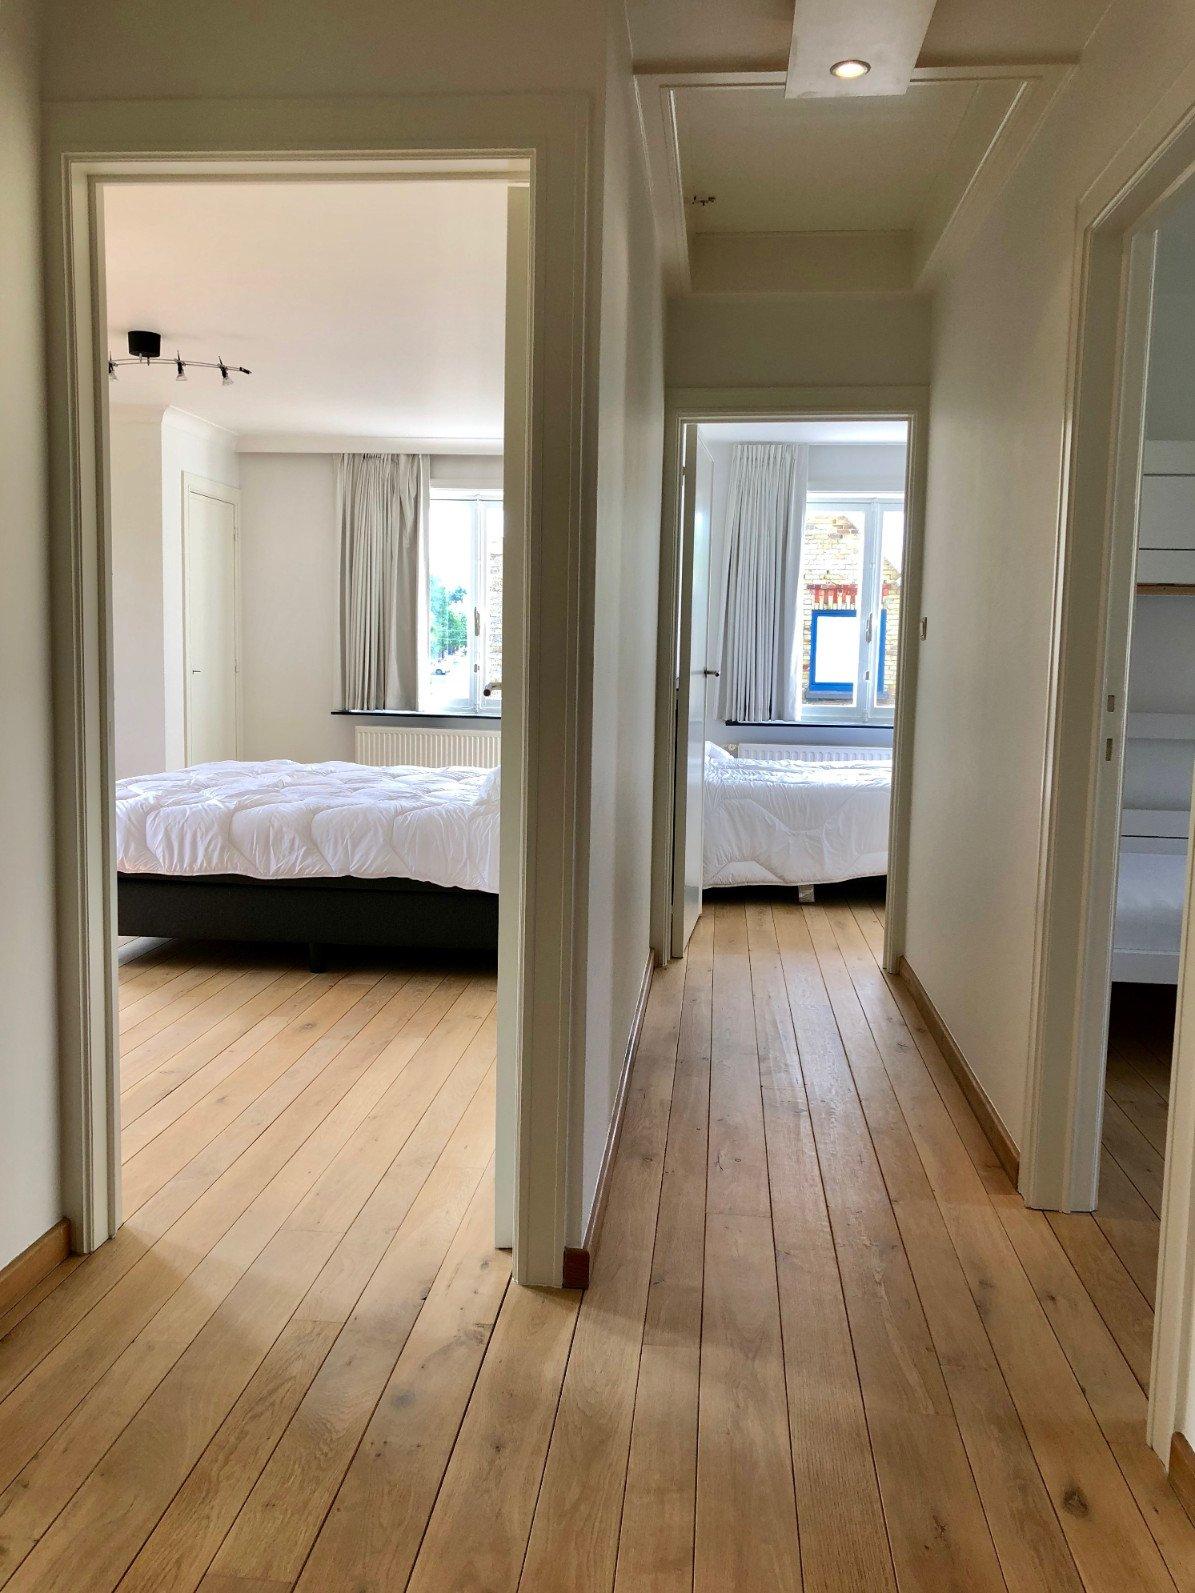 Rietveldprojects-Villa Were Di - Te Koop : Te Huur (per week)15